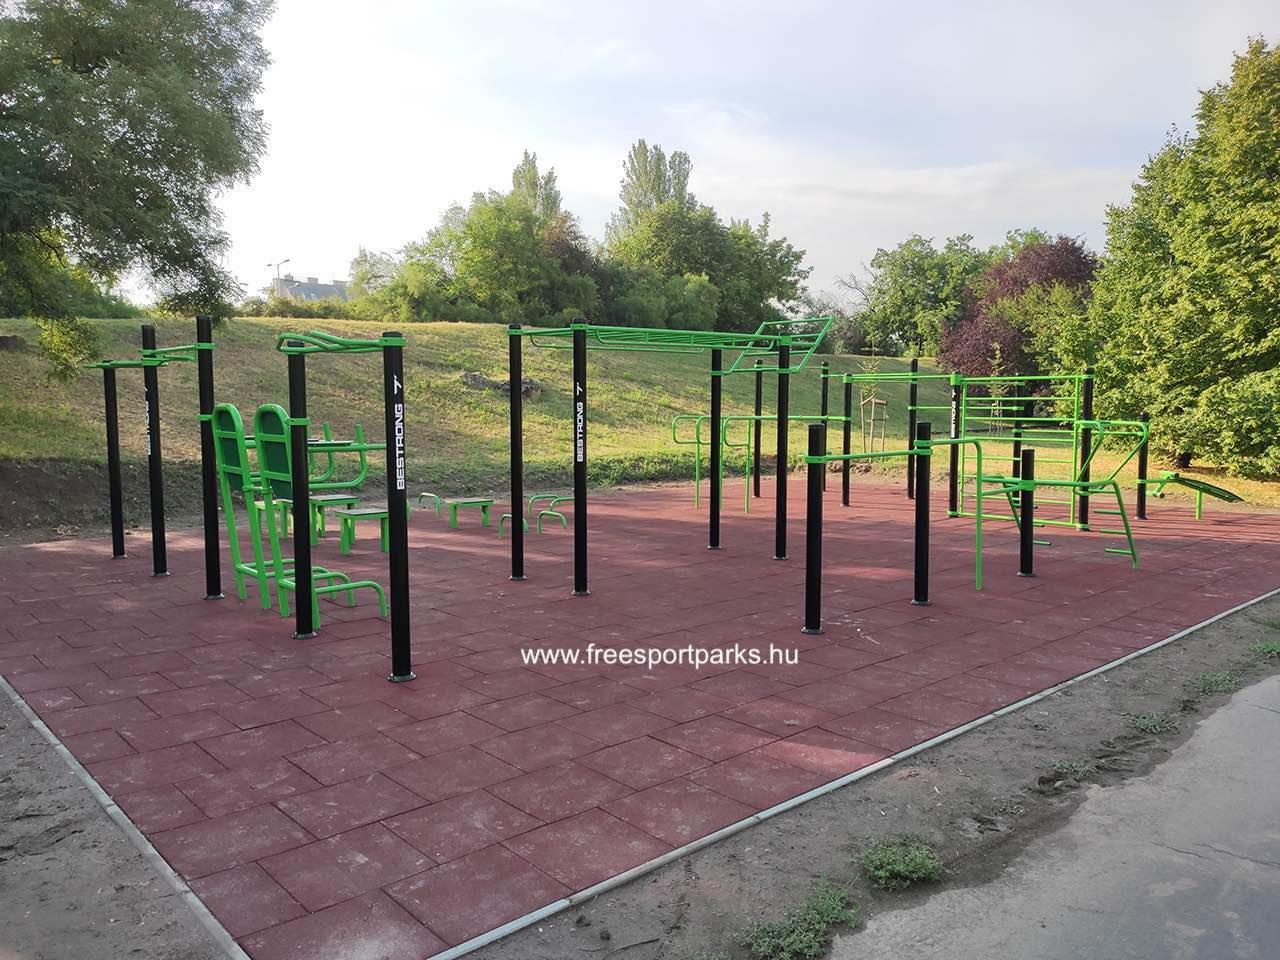 Búza utca (Bud Spencer Park) - Óbudai kondipark (Street Workout Park) - Free Sport Parks térkép